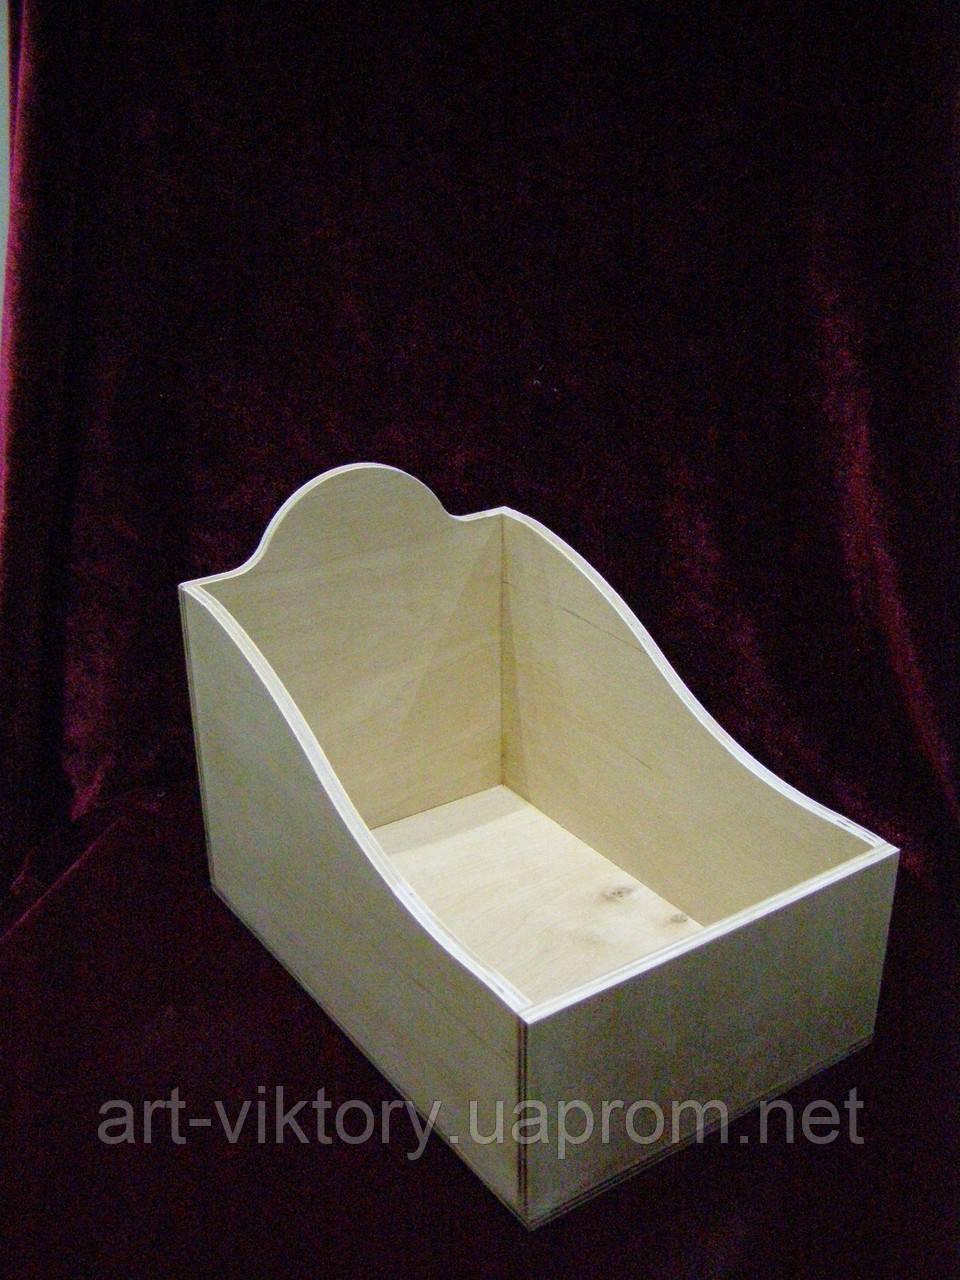 Короб для специй и мелочей (21 х 15 х 14 см)